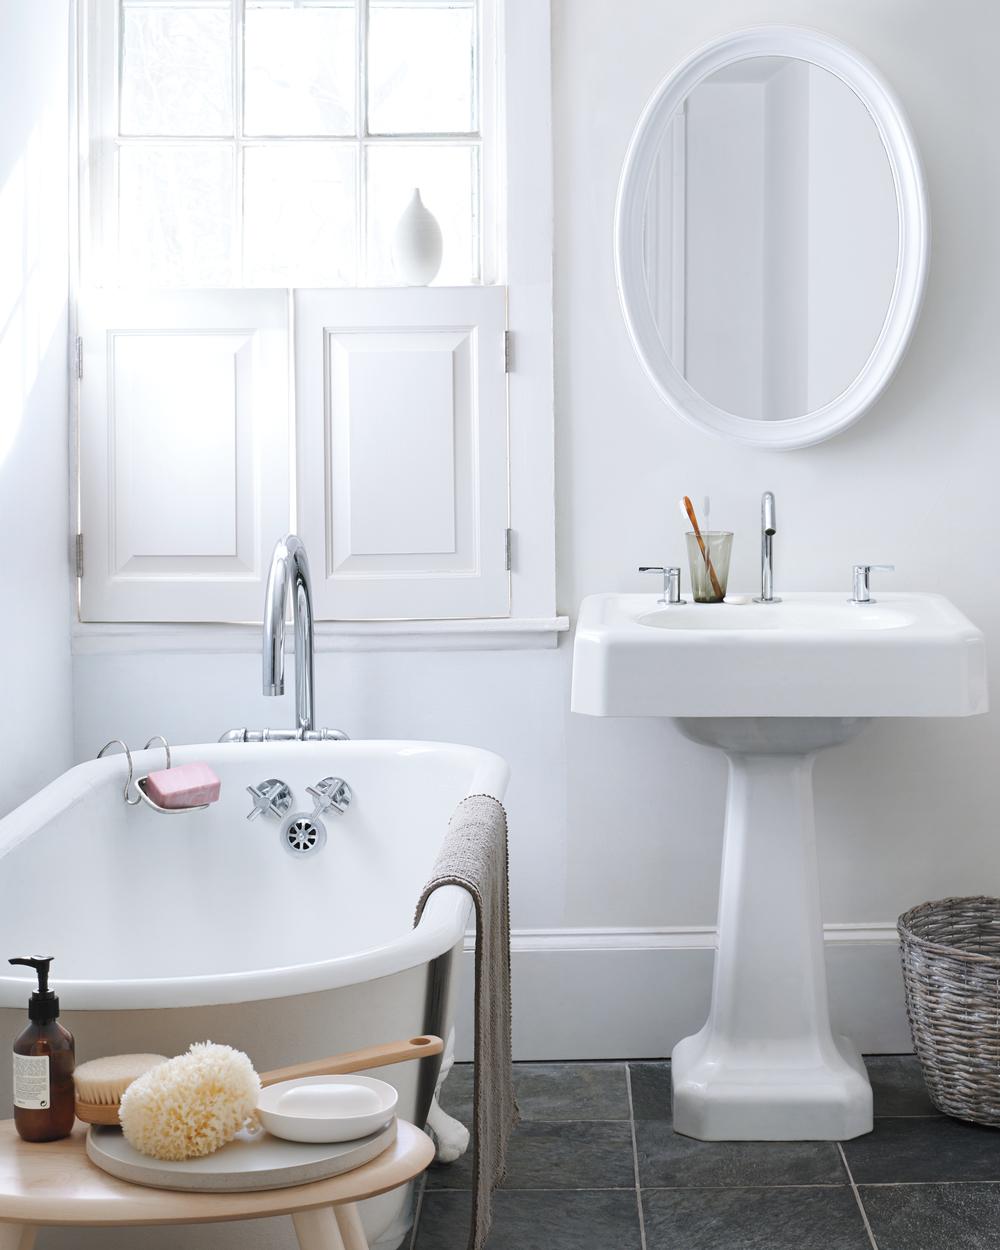 MLD110961-SpringCleaning-bathroom-033.jpg